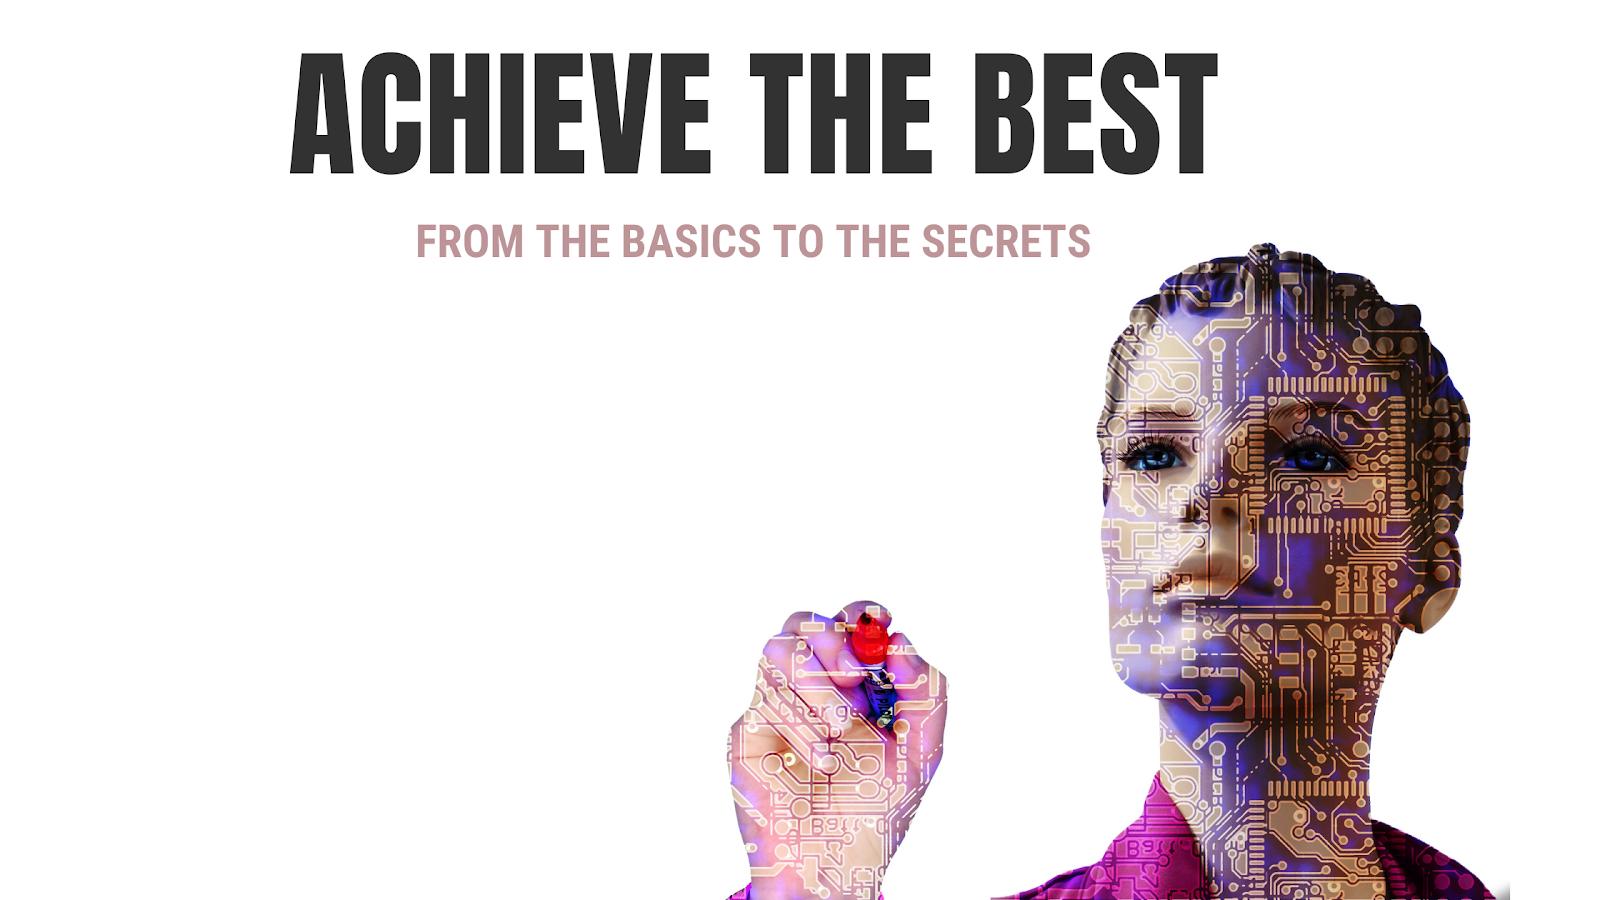 Achieve the best